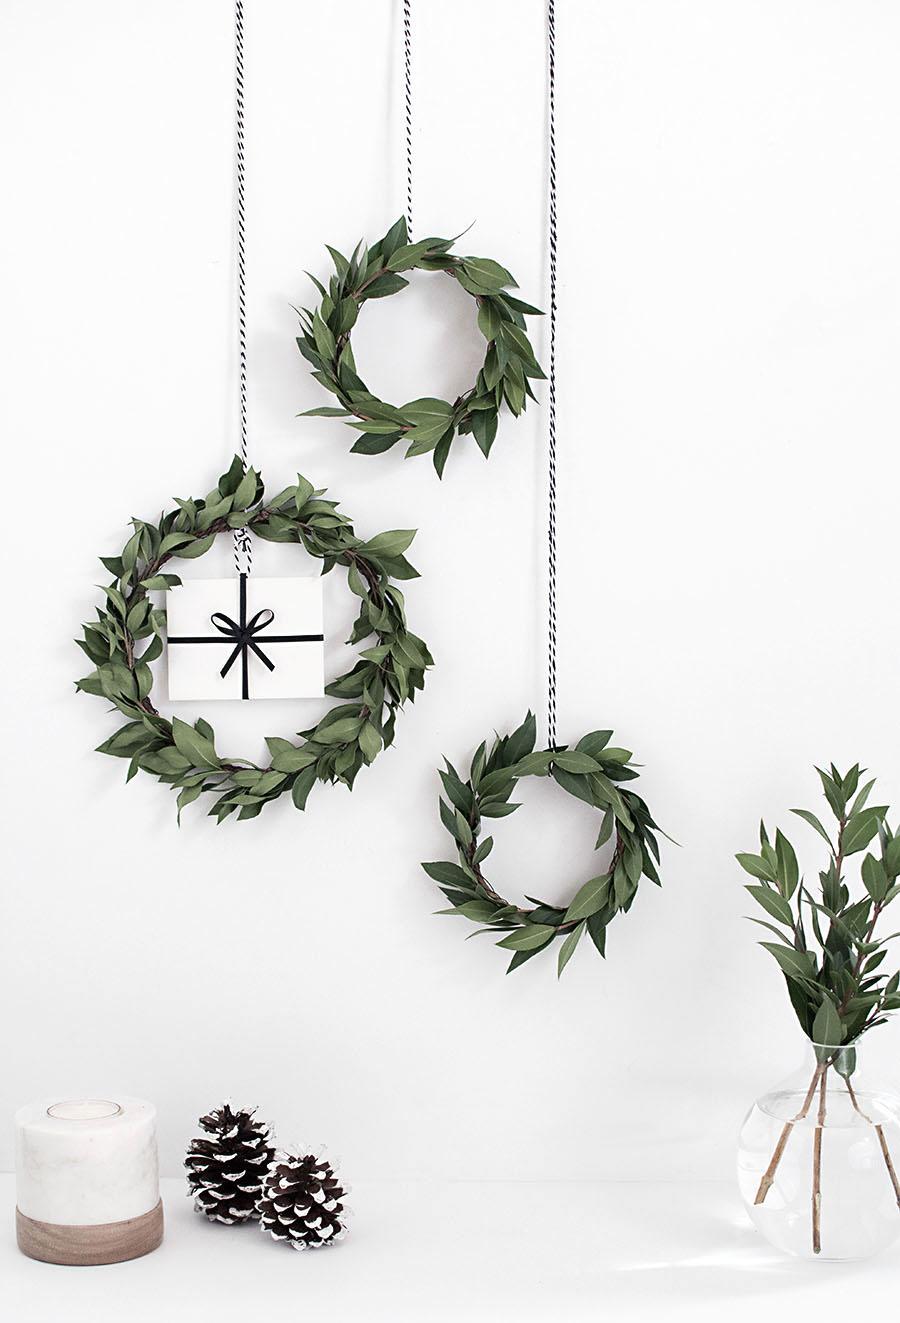 DIY gift card mini wreath - Homey Oh My!